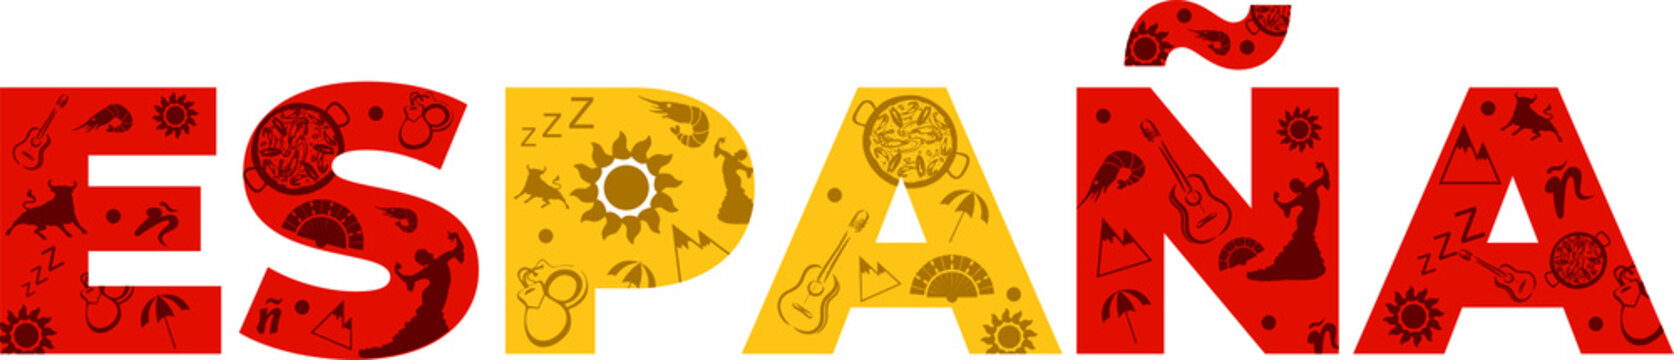 Diseño letras España. Cosas típicas